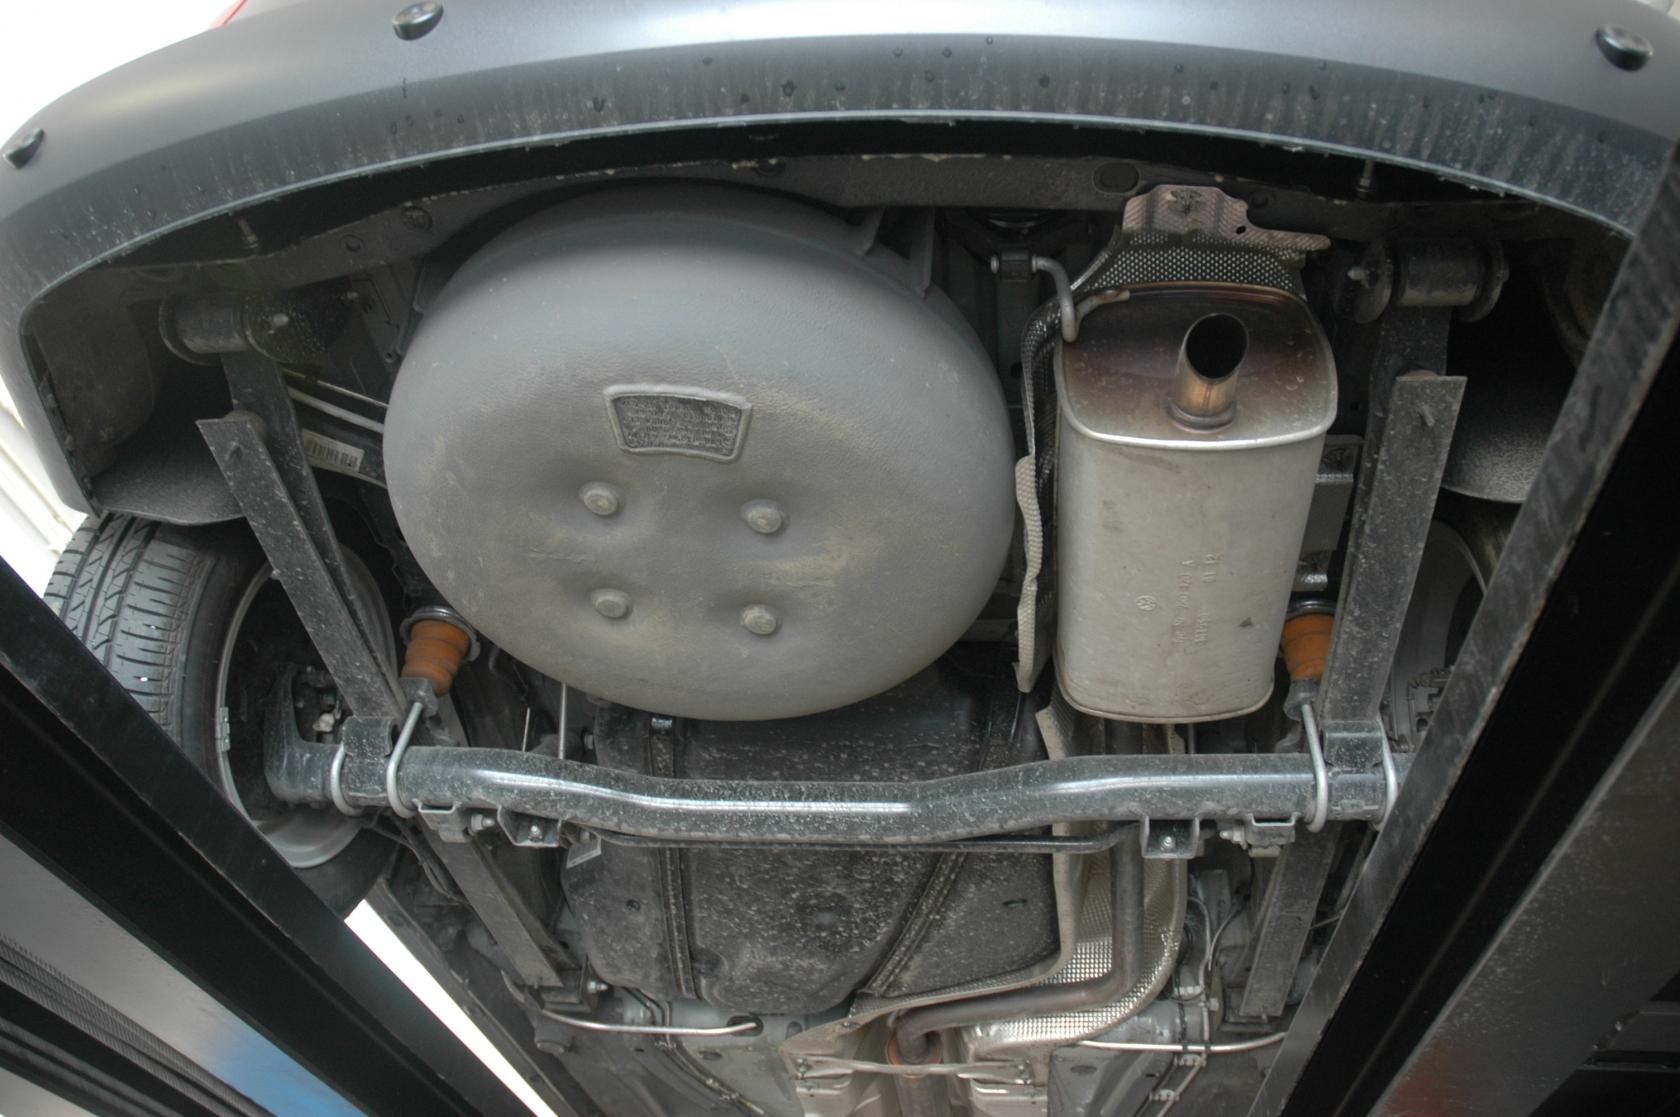 Vw Kit Cars >> VW Caddy BiFuel technical details, history, photos on Better Parts LTD